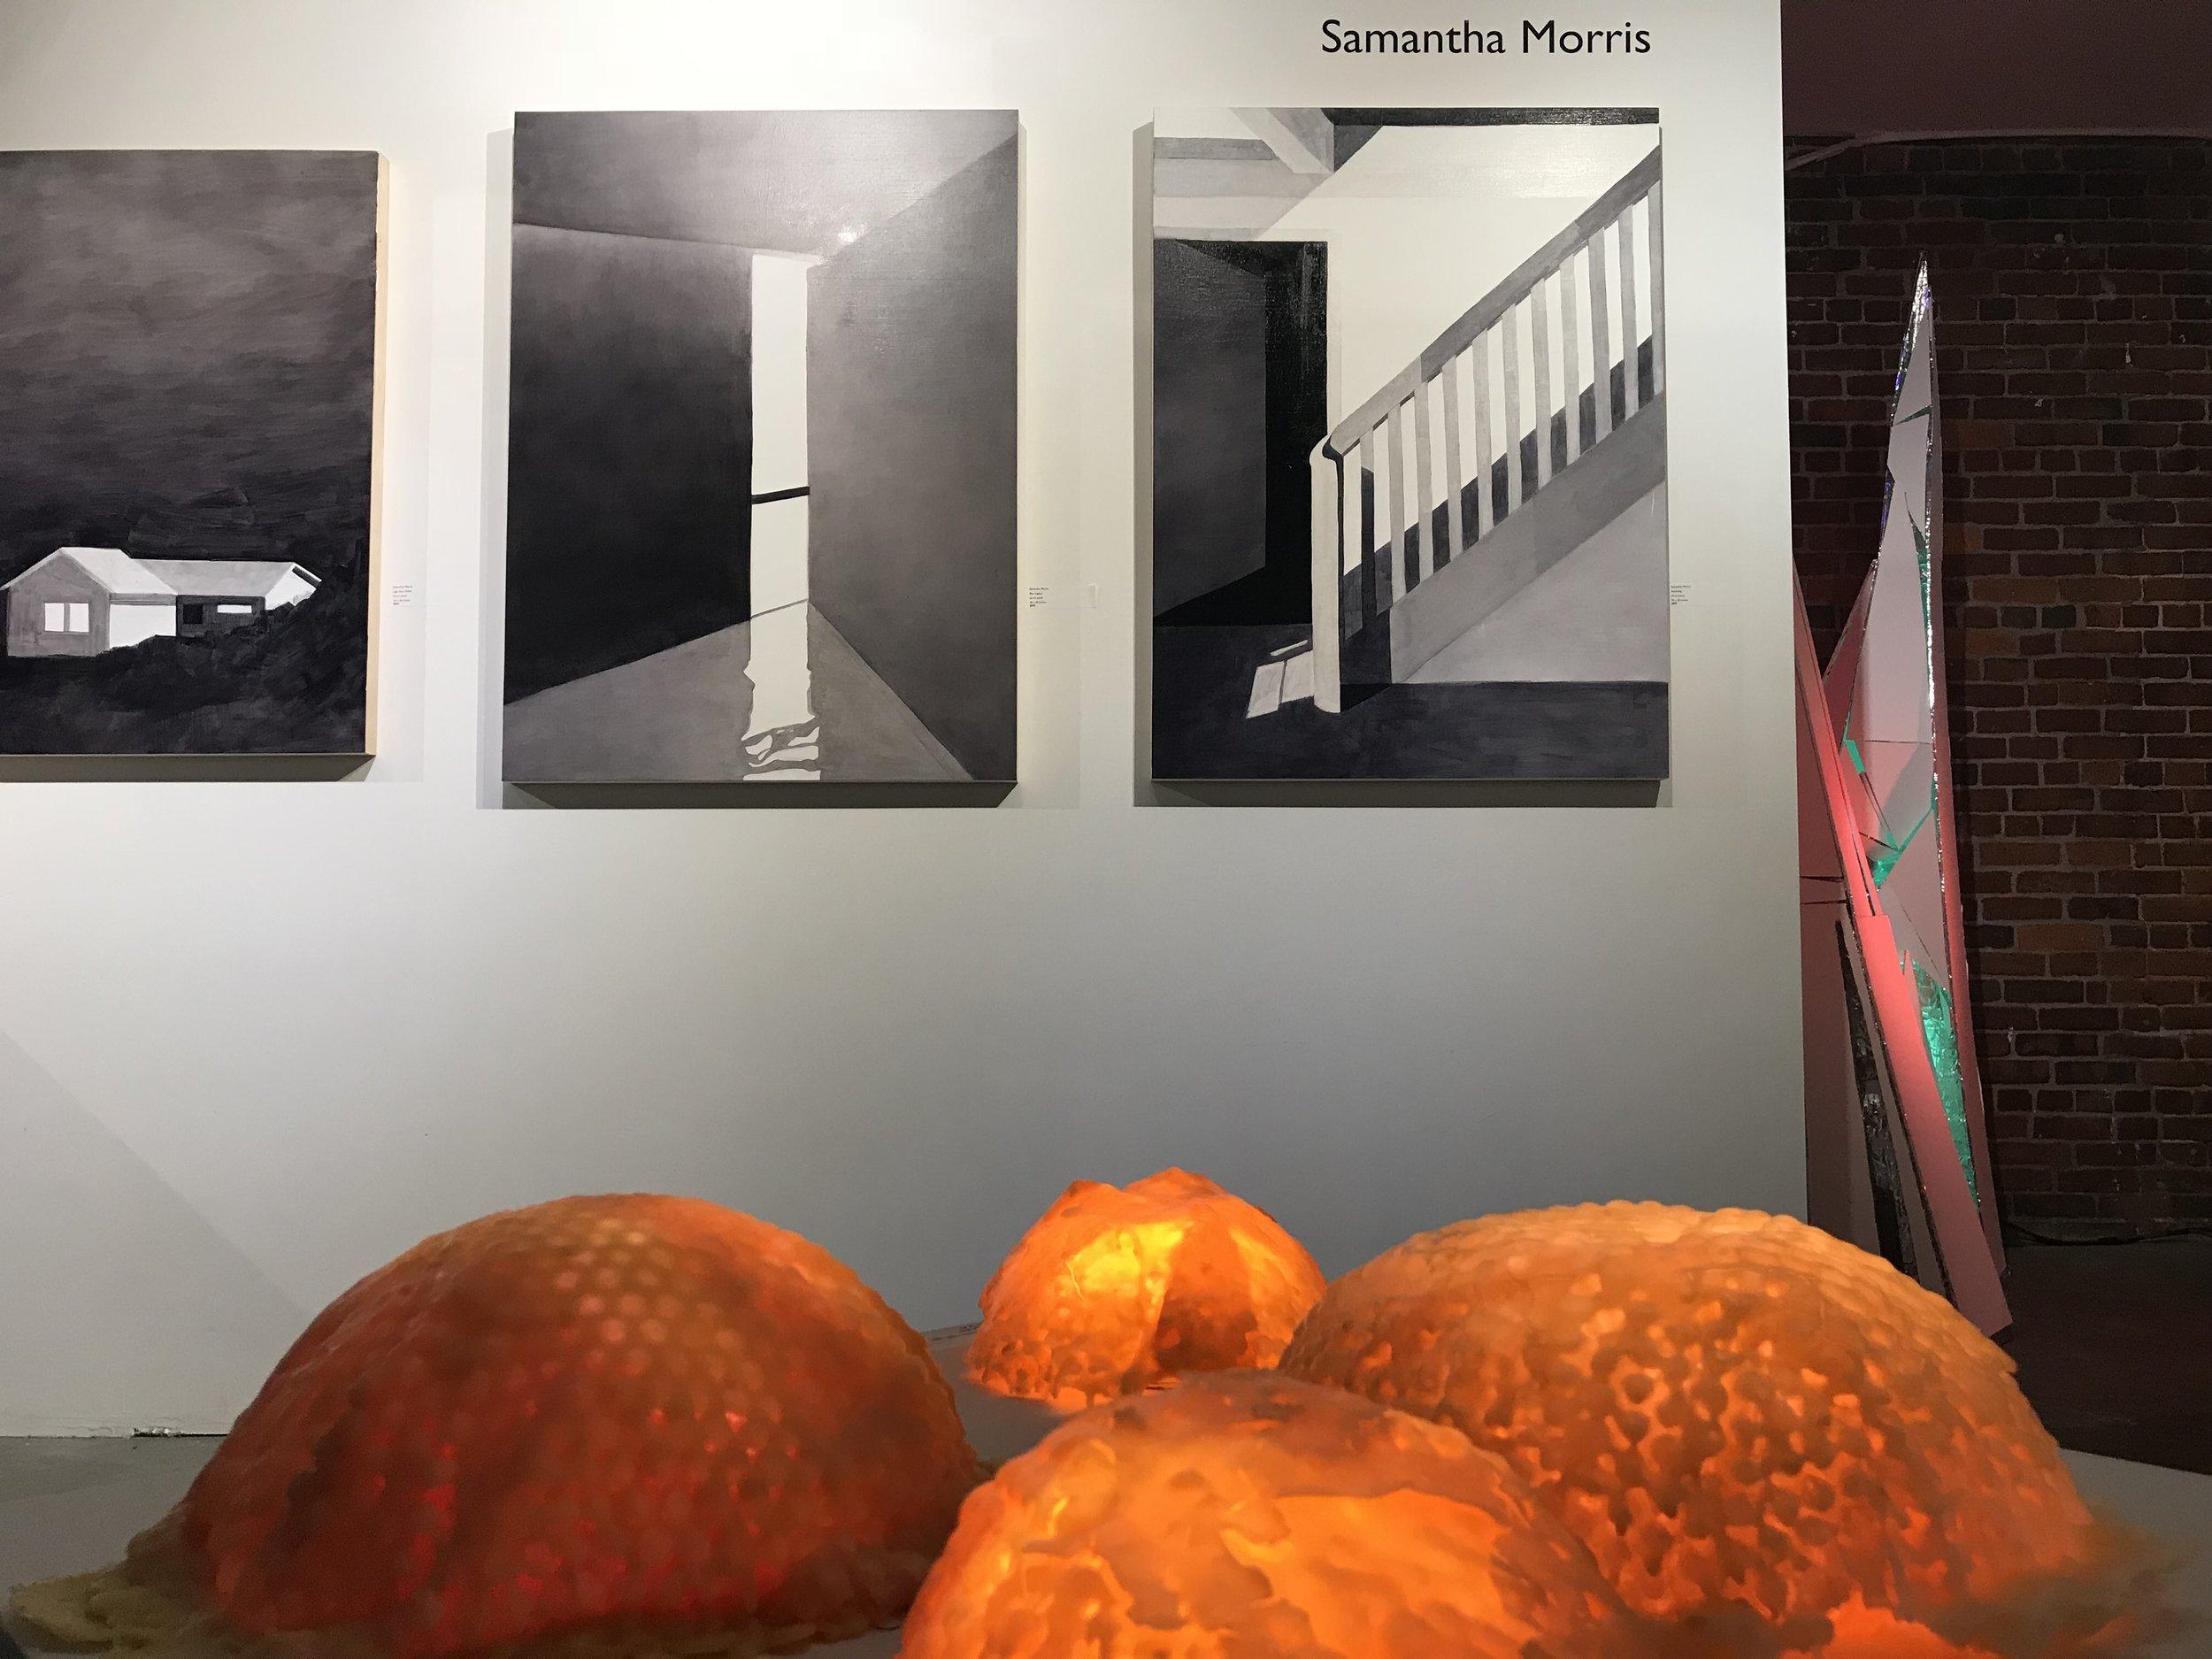 Works by Isabel Beavers Samantha Morris